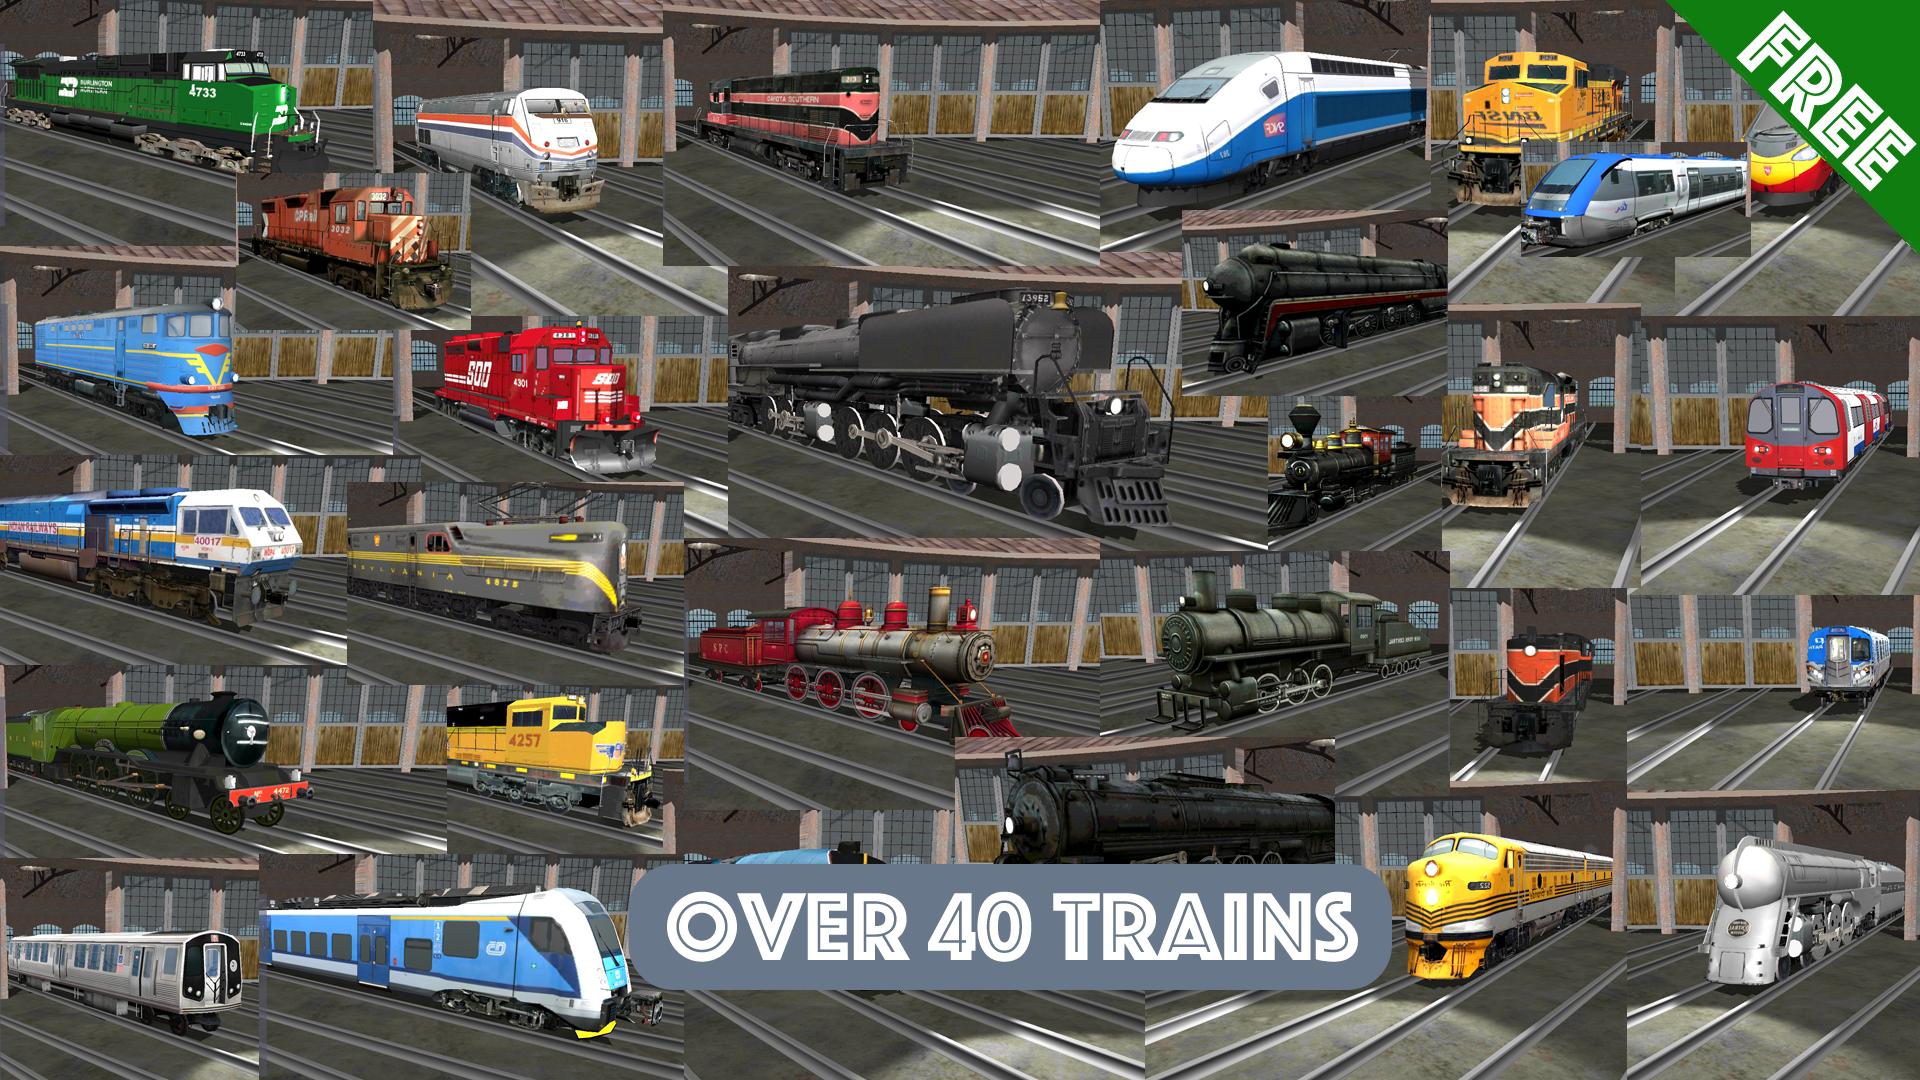 Train Sim: Amazon.es: Appstore para Android